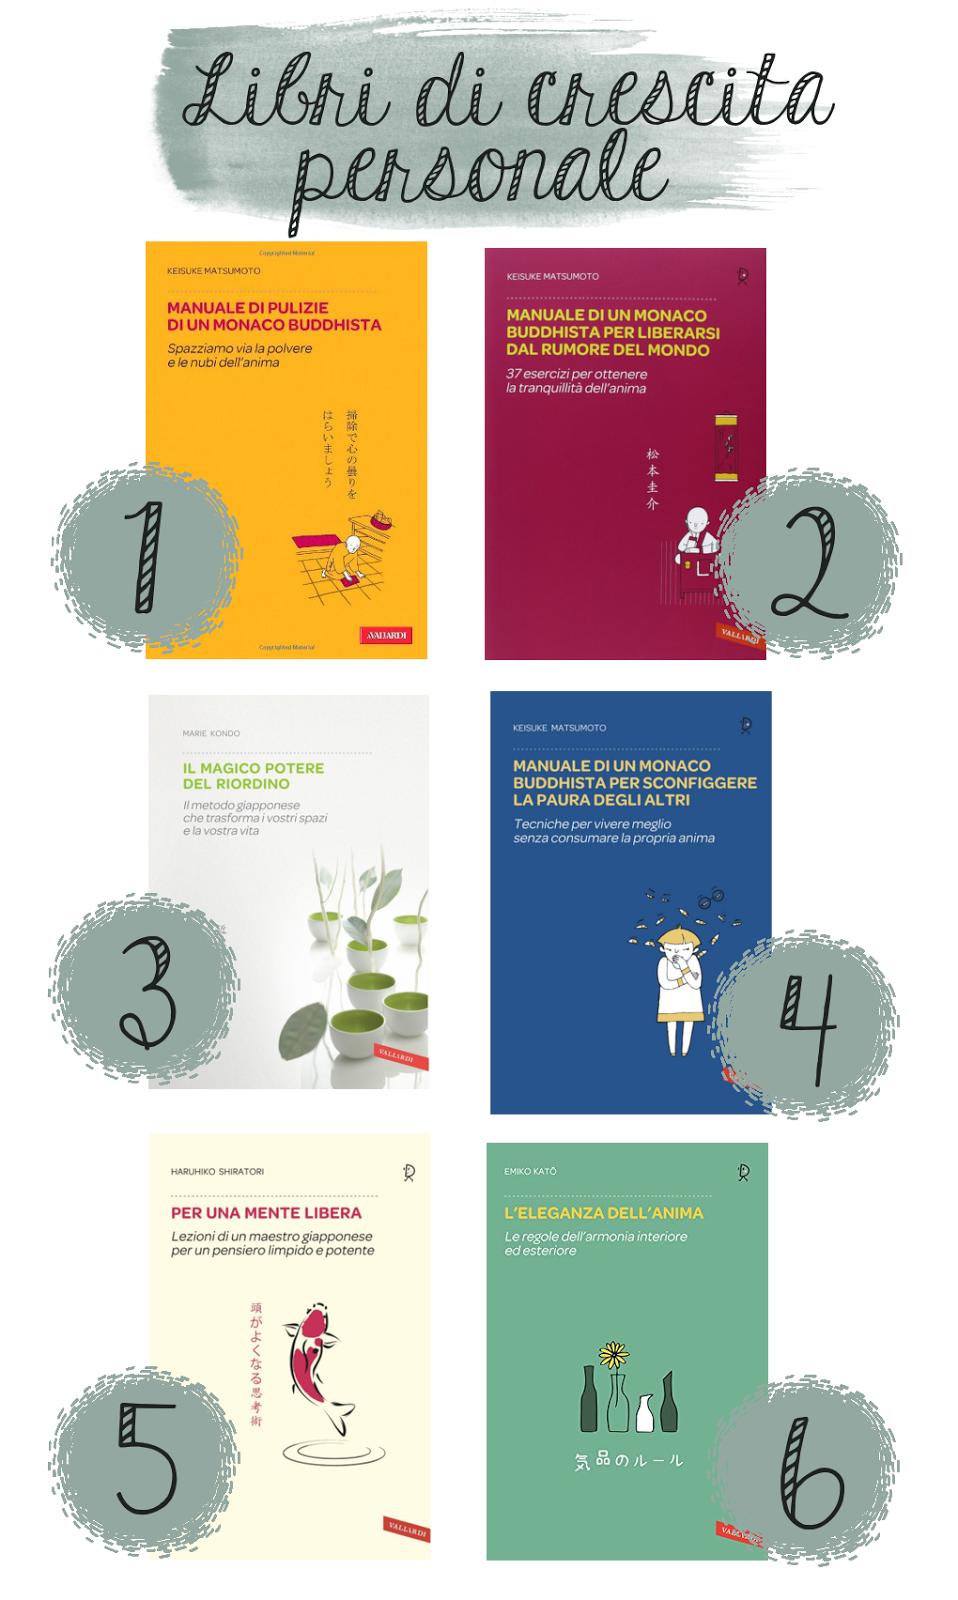 libri di crescita personale - consulenza macrobiotica